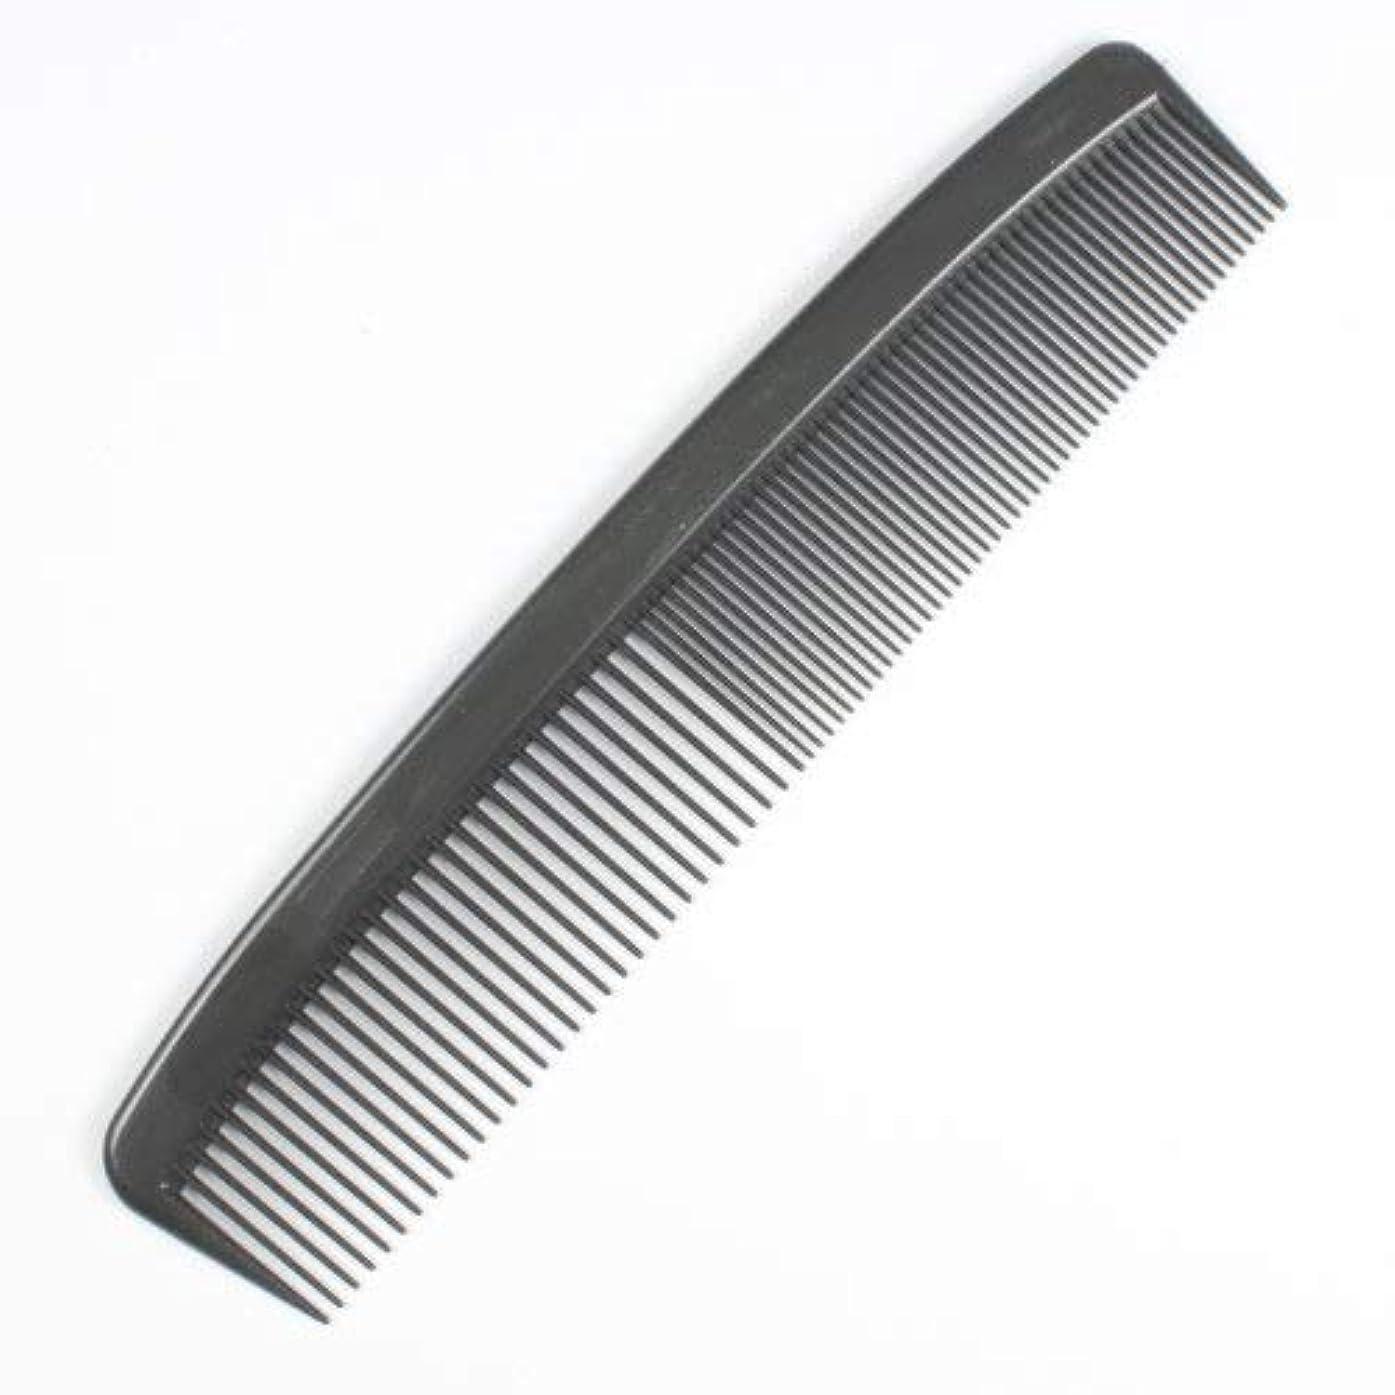 表面聴覚障害者歯科医Dynarex Adult Combs, 5 Inches, Black, 240 Count [並行輸入品]